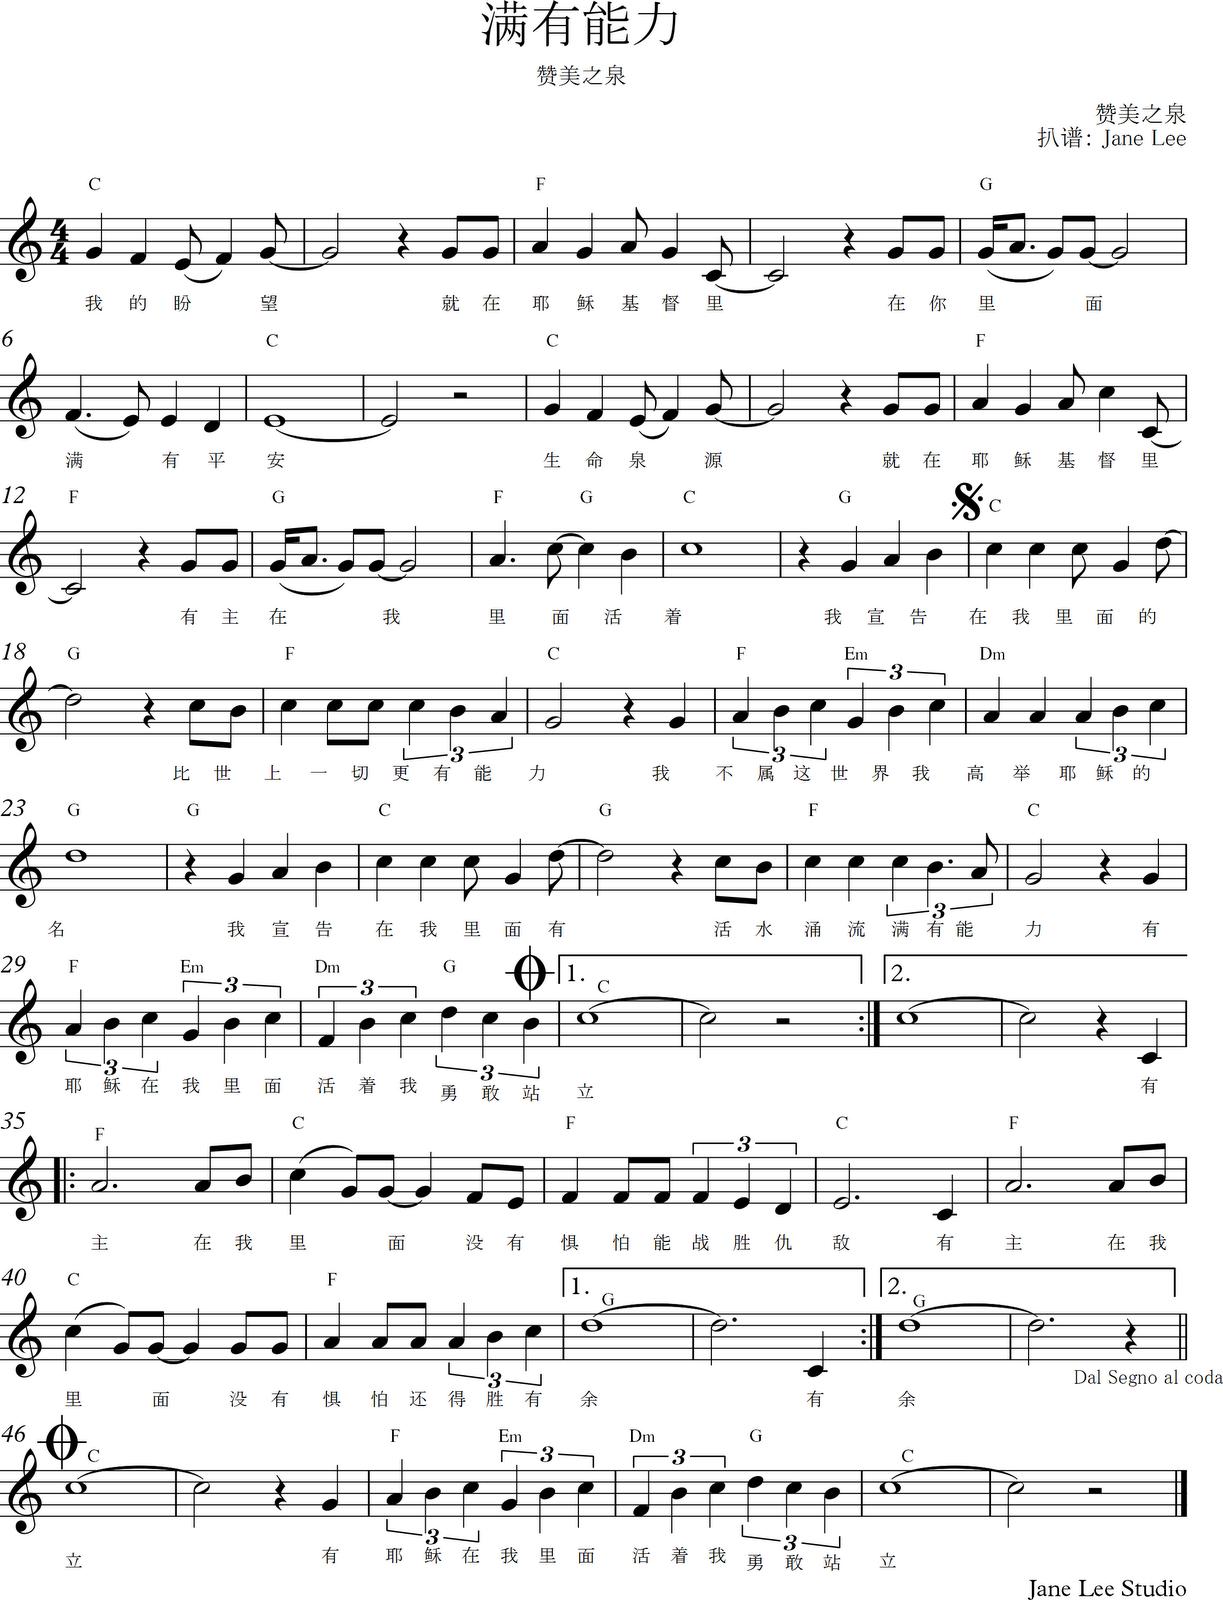 Ripple guitar chords